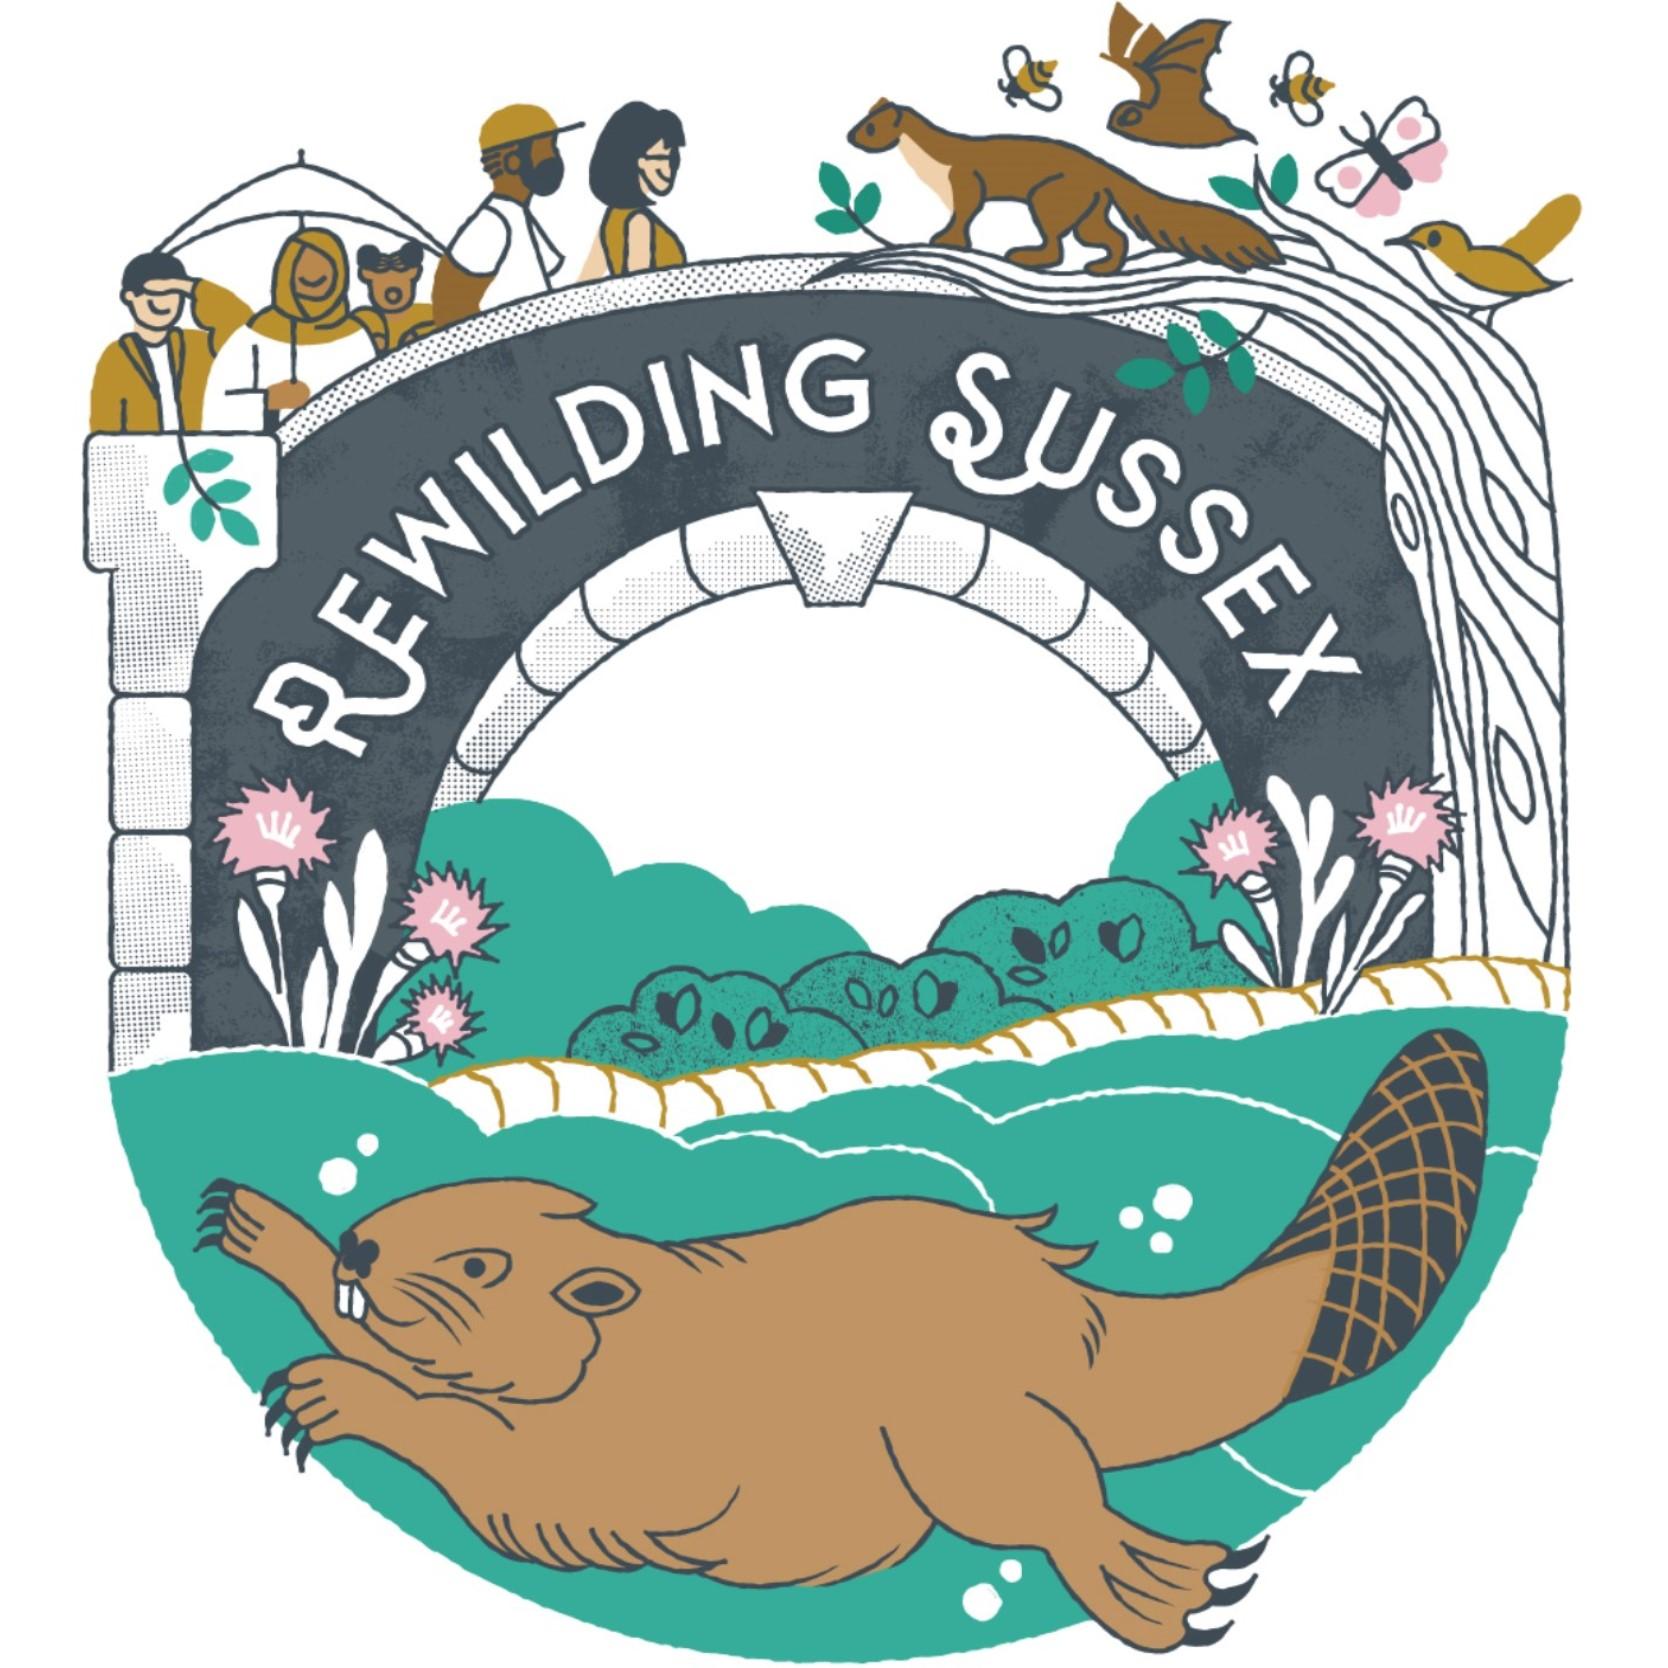 Rewilding Sussex